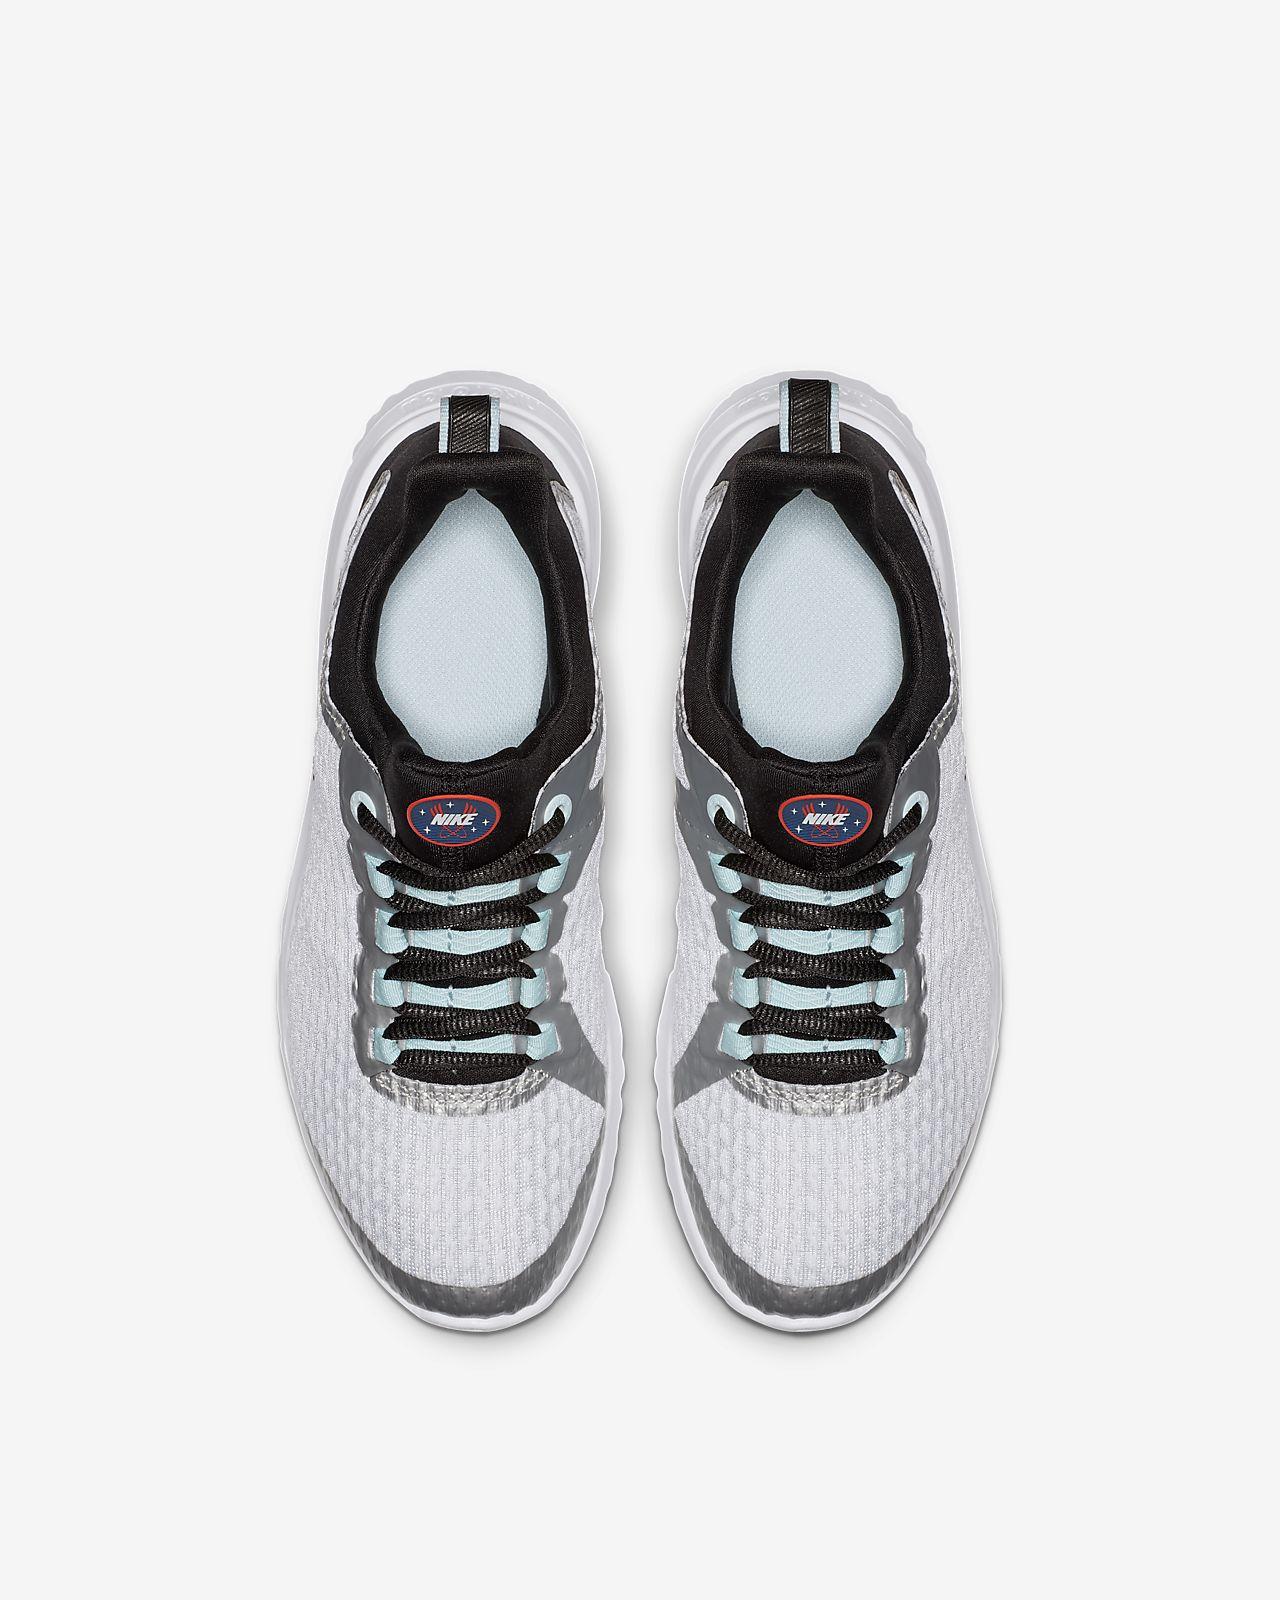 buy online f5bba bdc5f ... Scarpa da running Nike Renew Rival SD - Ragazzi